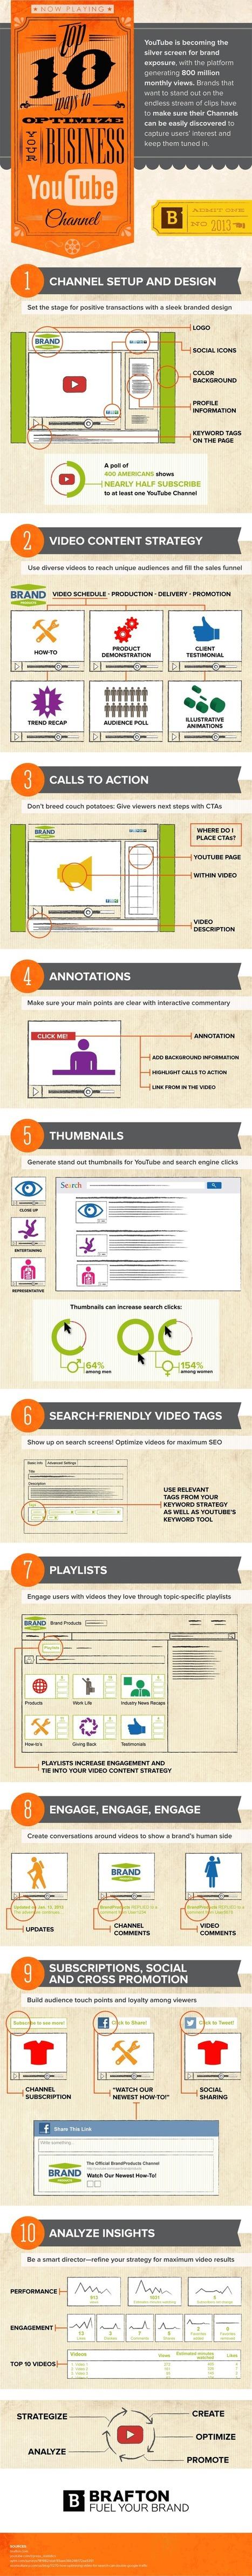 YouTube Marketing Cheat Sheet | MarketingHits | Scoop.it